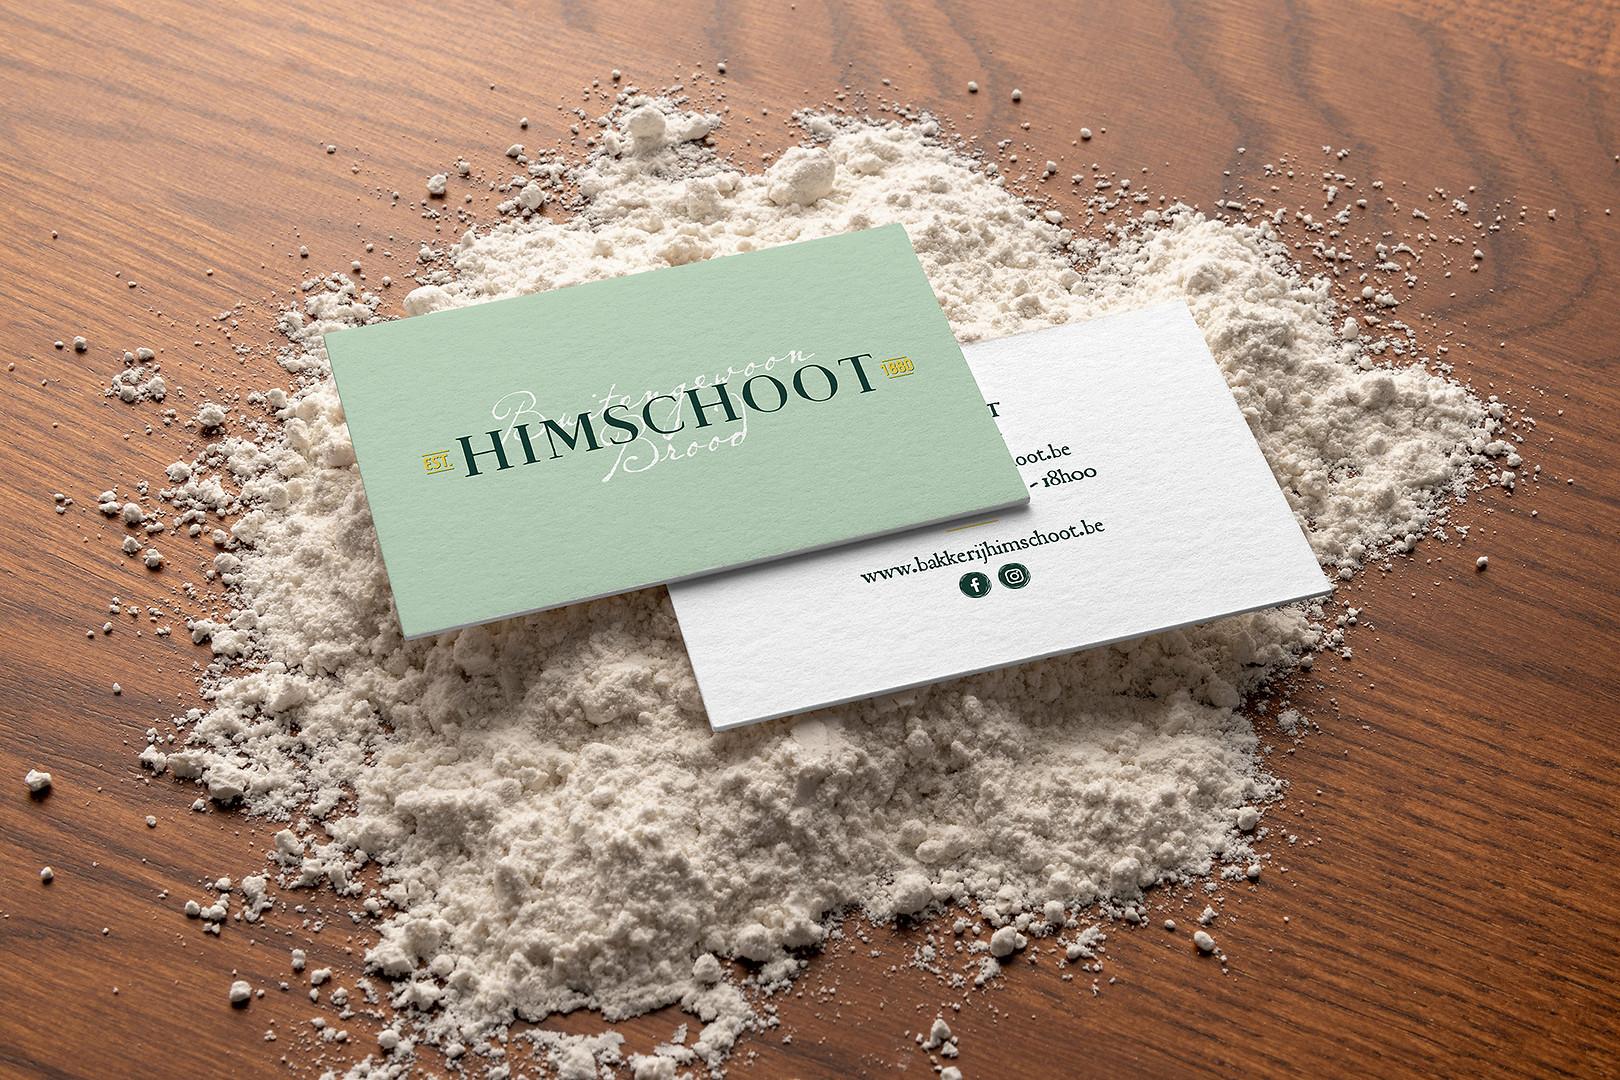 himschoot cards.jpg